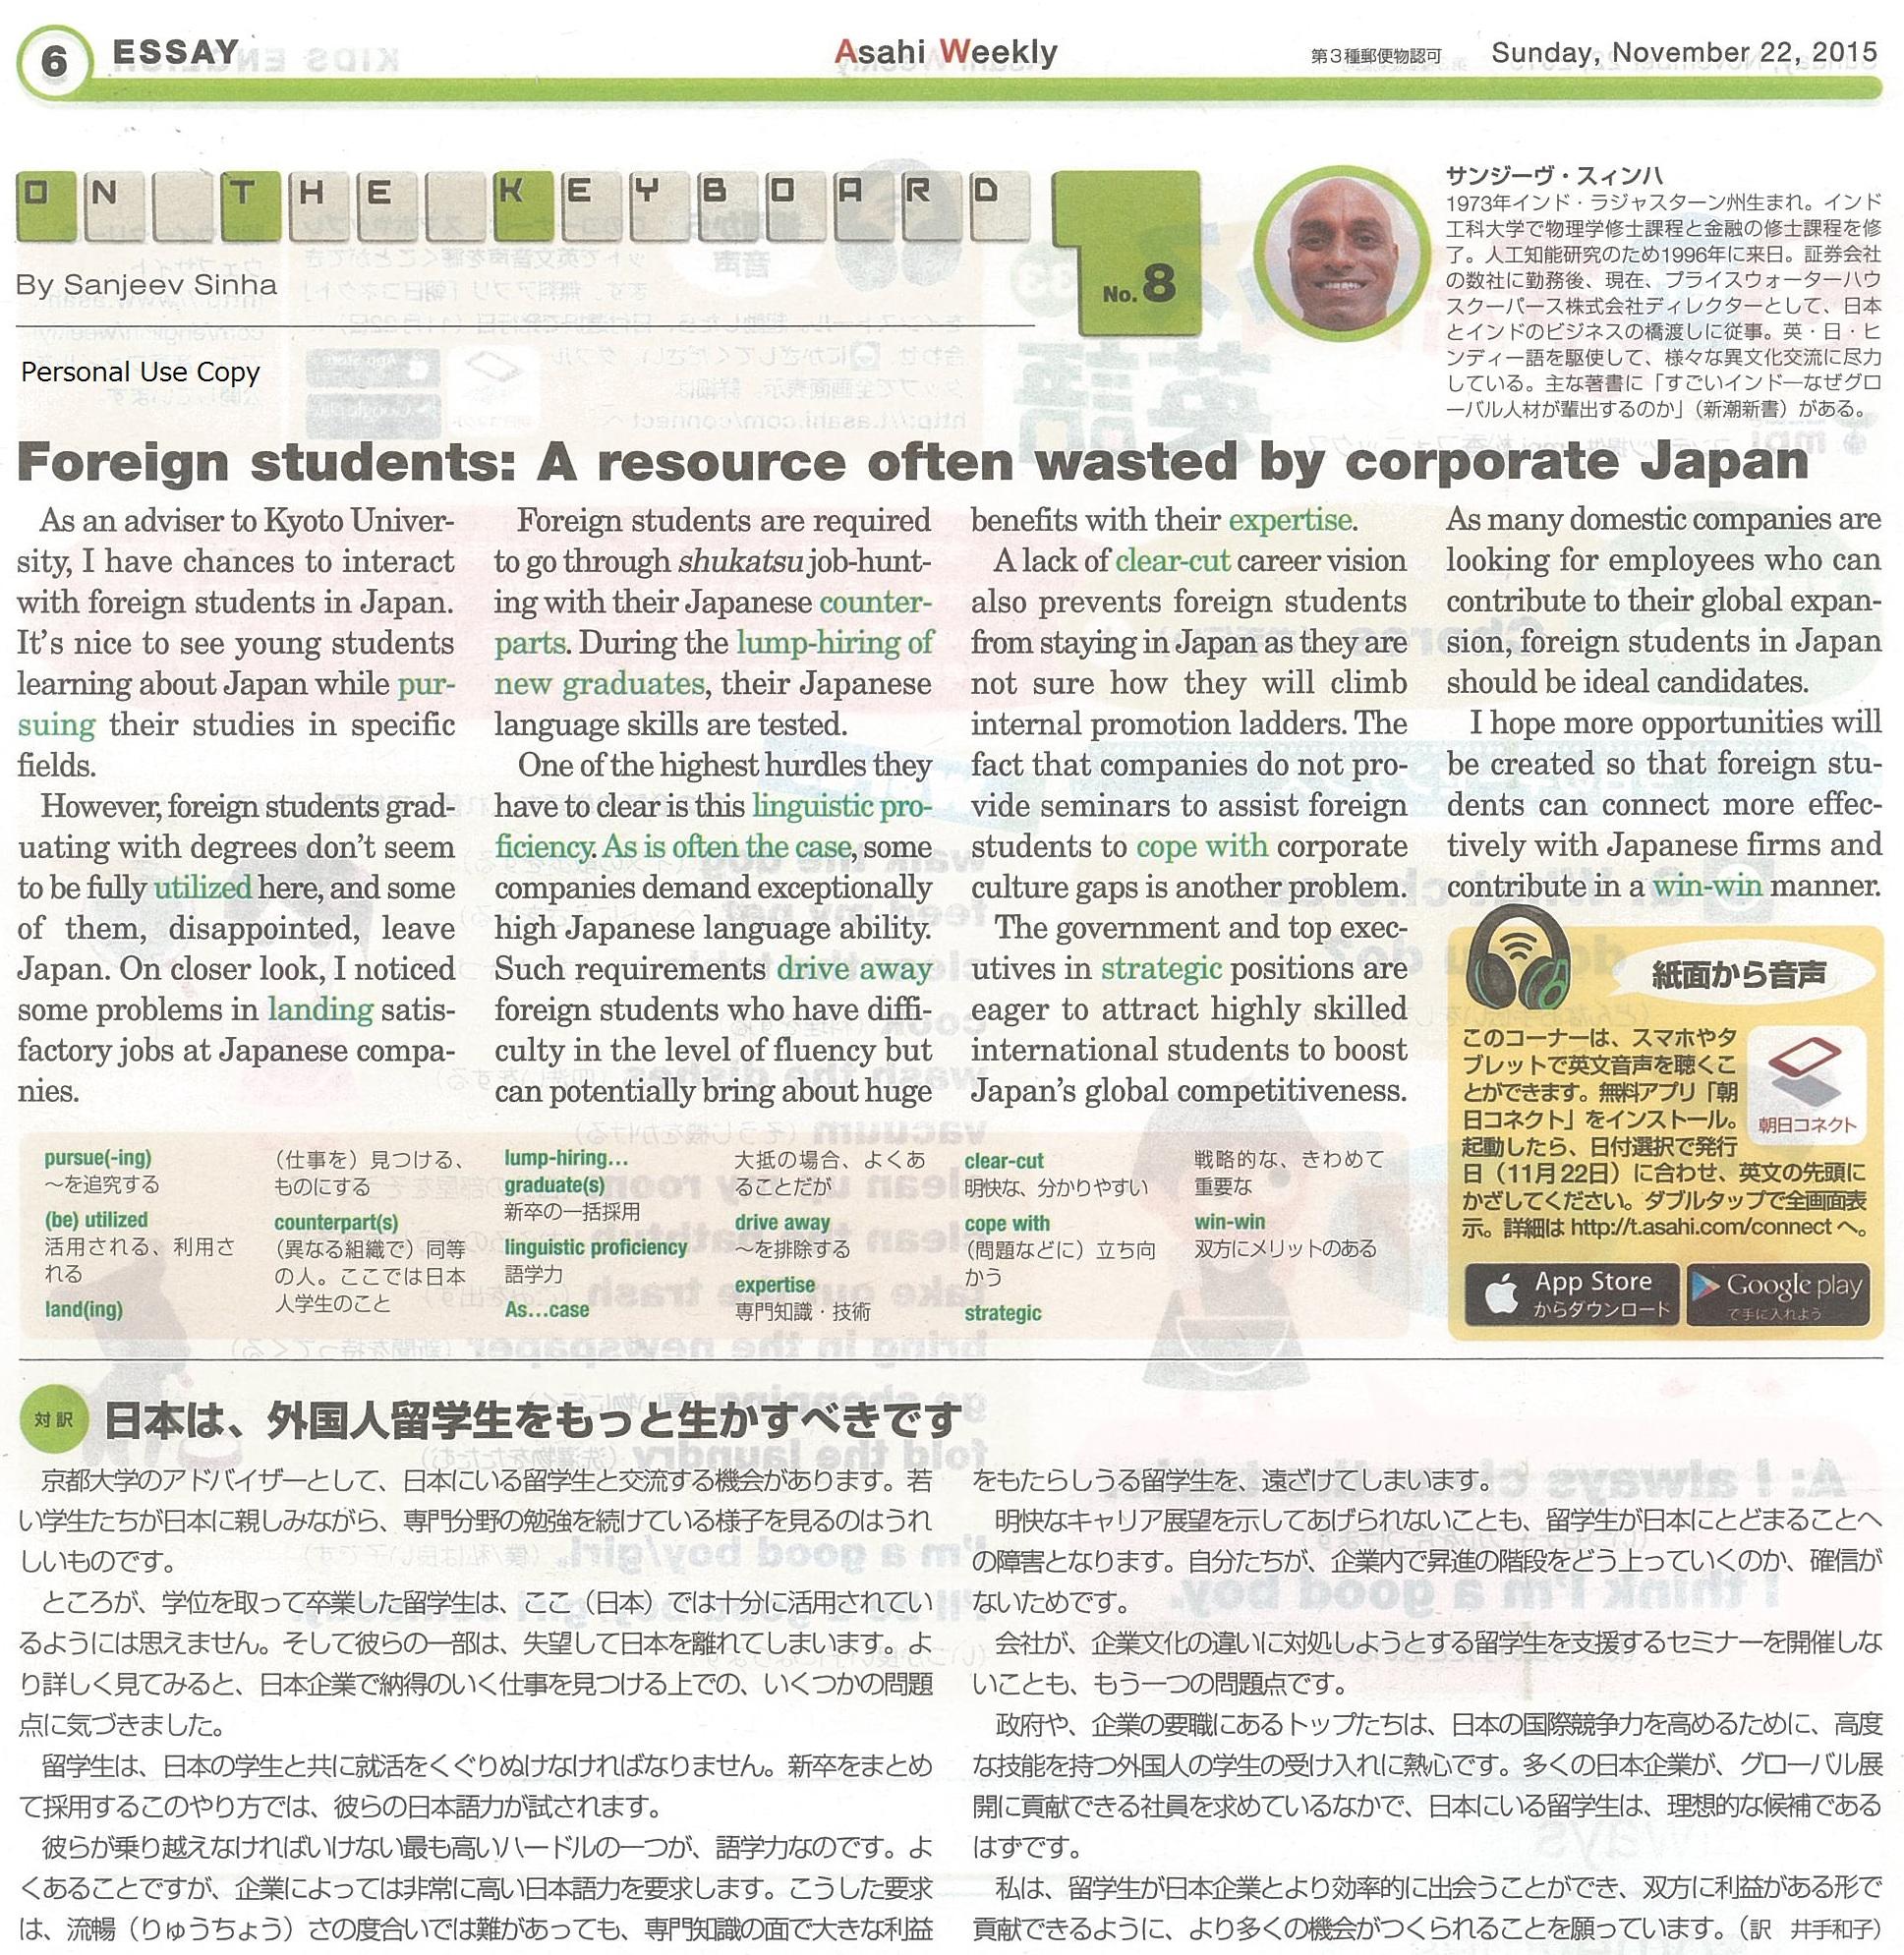 AsahiWeeklyForeignStudentsInJapanBySanjeevCRCP